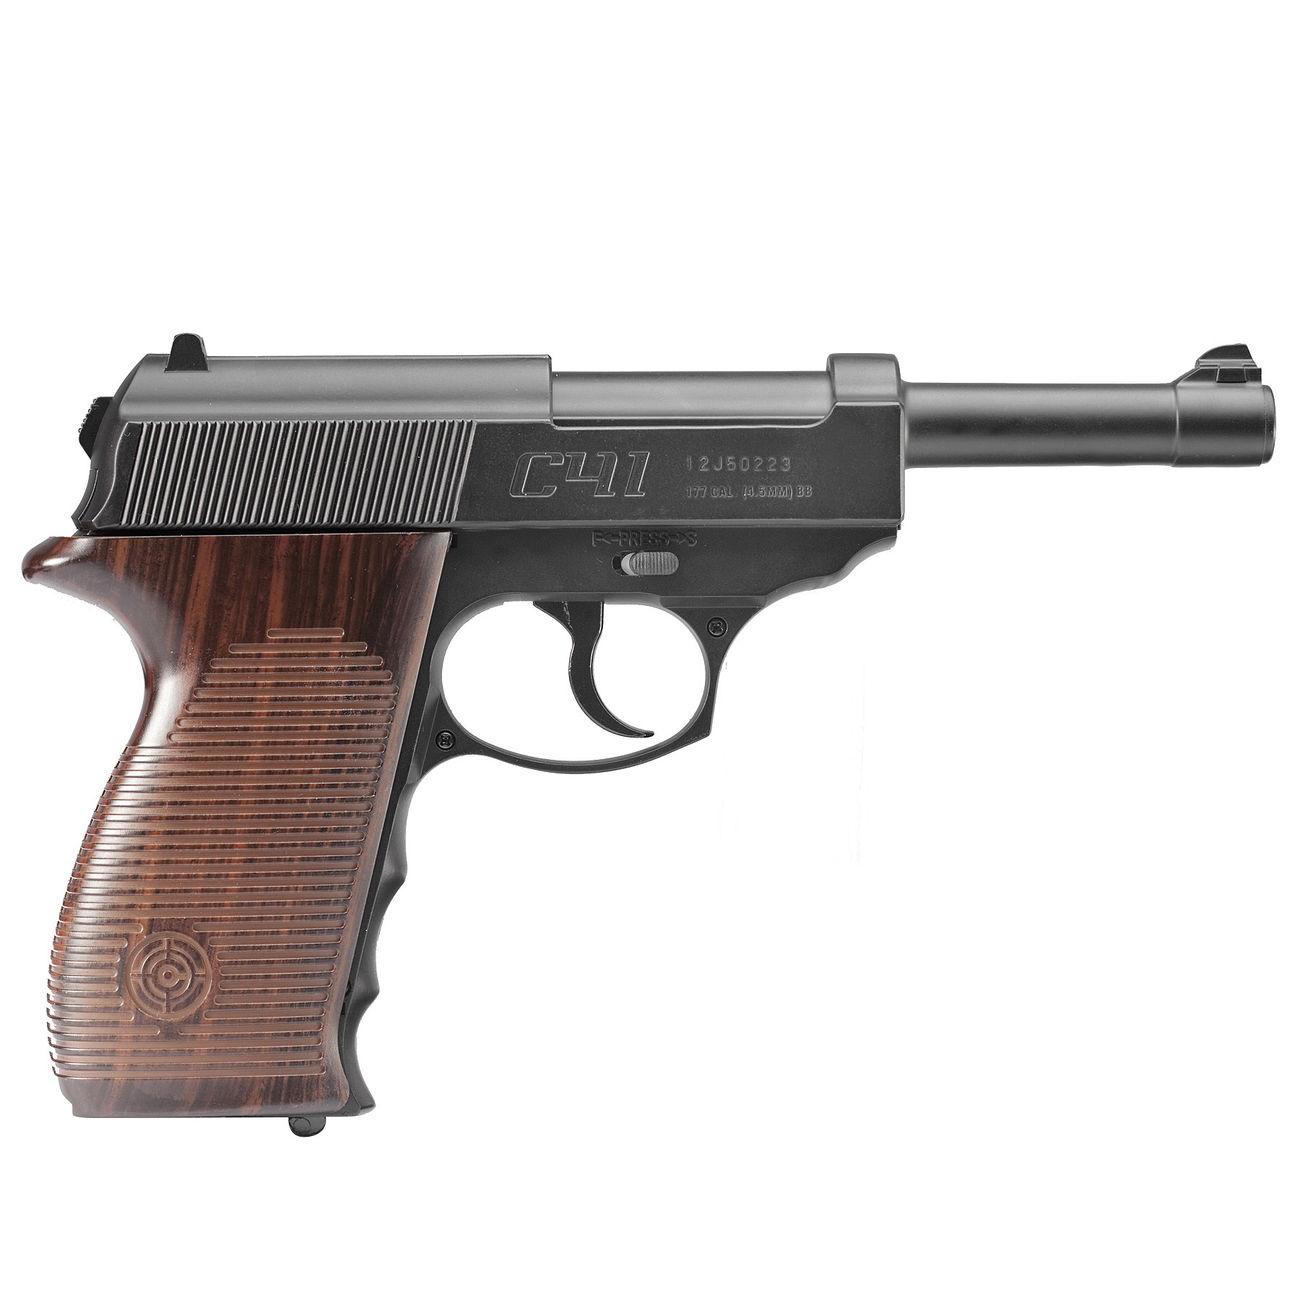 crosman c41 co2 pistole 4 5mm bb komplettset deluxe g nstig kaufen kotte zeller. Black Bedroom Furniture Sets. Home Design Ideas